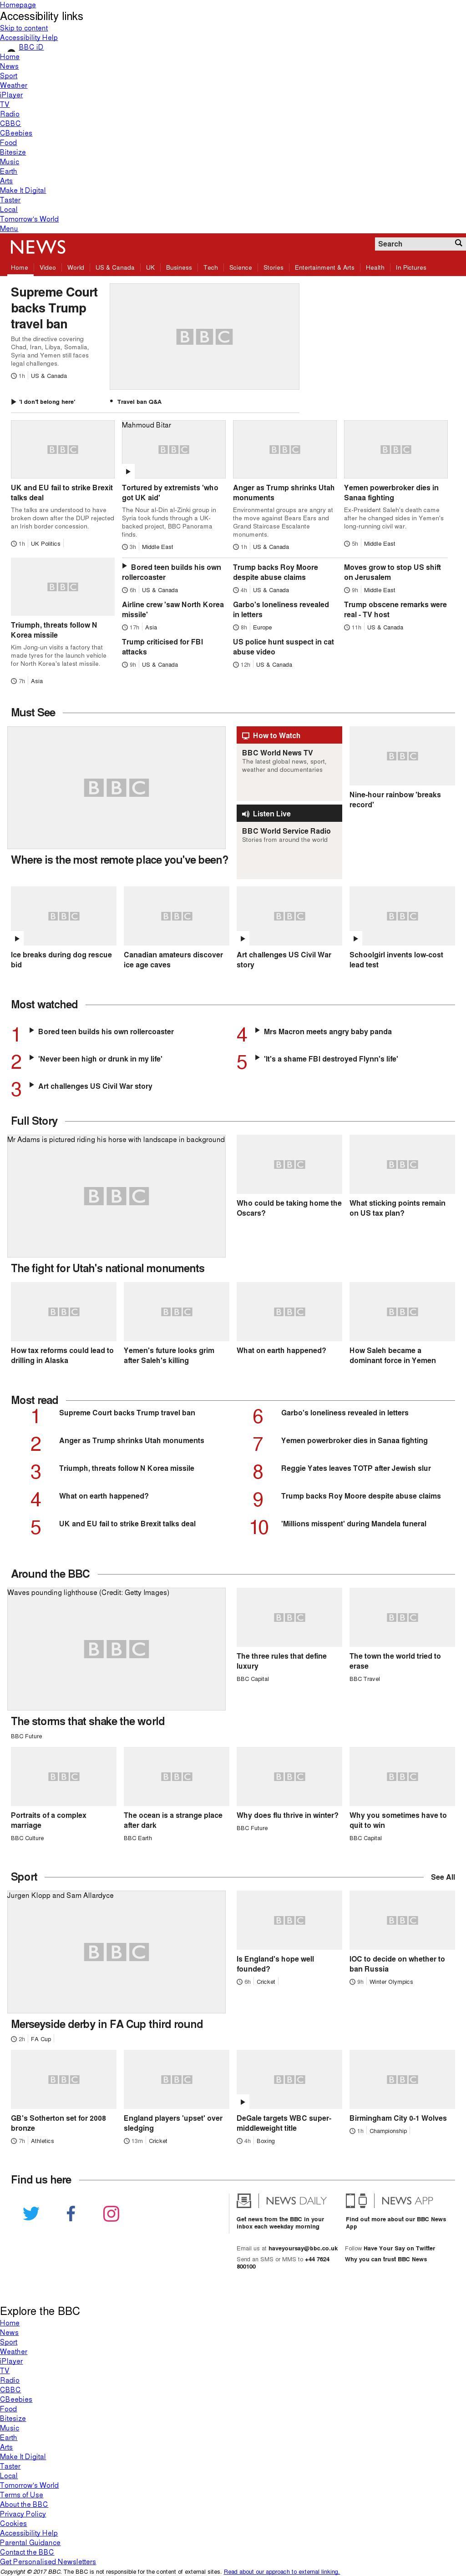 BBC at Tuesday Dec. 5, 2017, midnight UTC